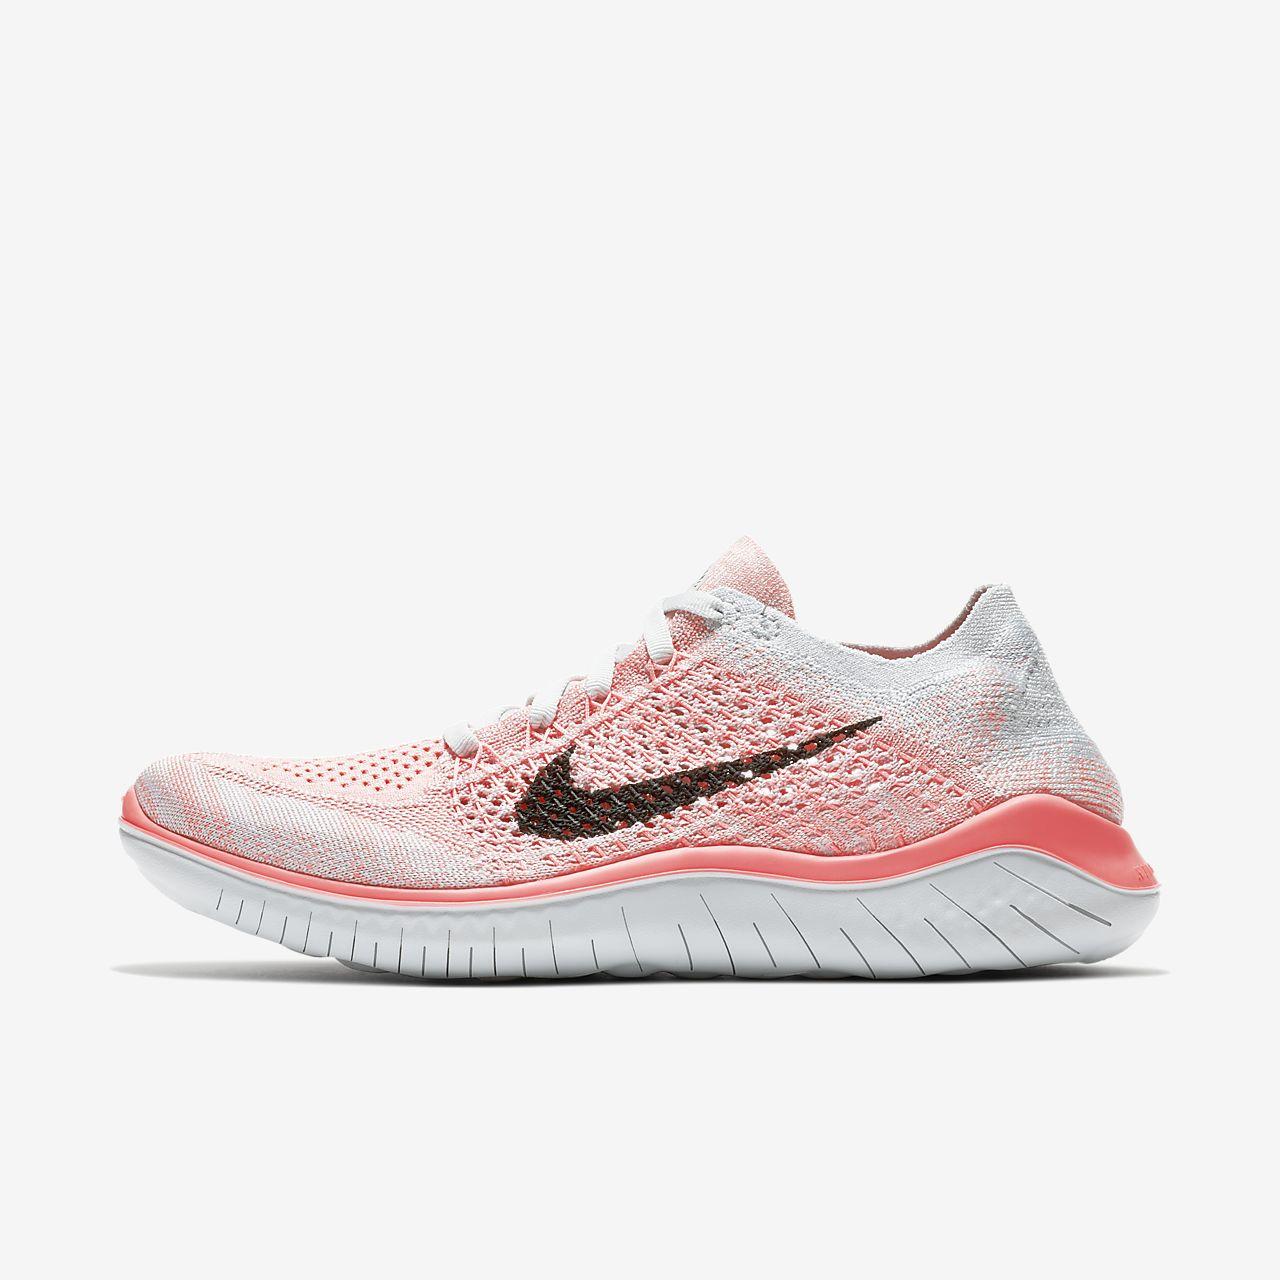 wholesale dealer bd891 829c2 ... sale nike free rn flyknit 2018 femmes chaussure de course rosa blanc eu  39 us 8 get femme running et trail nike free 5.0 ...